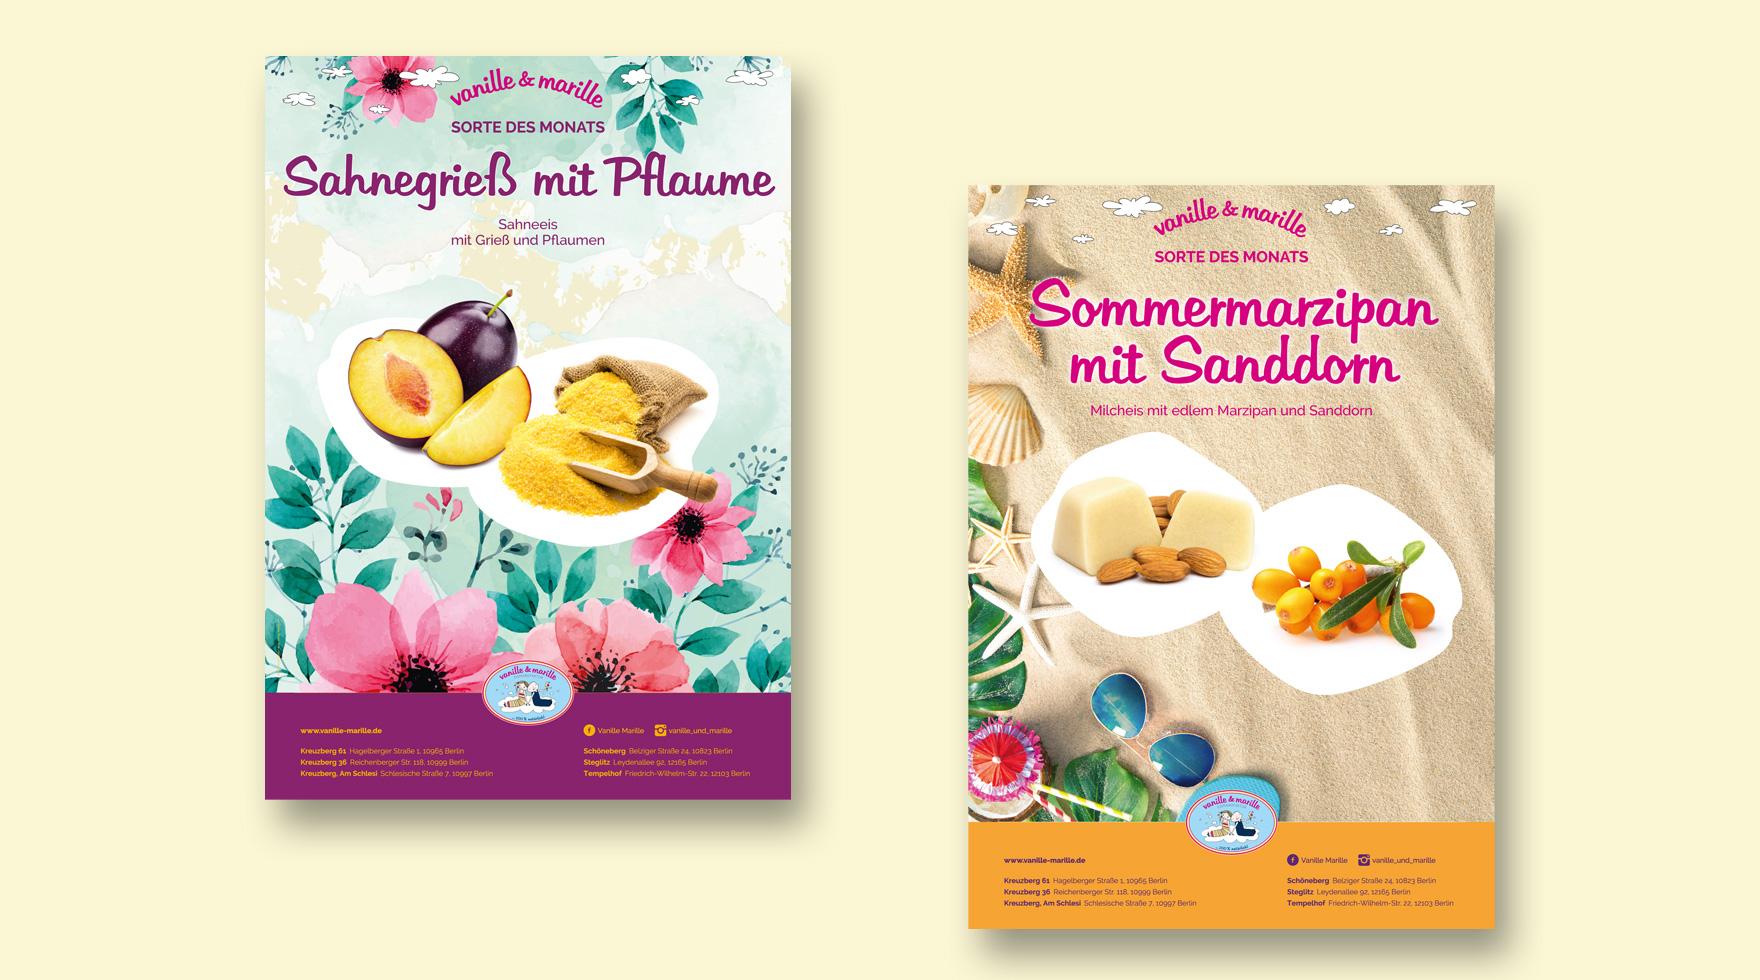 grafikdesign-plakate-vanille-marille-berlin-agentur